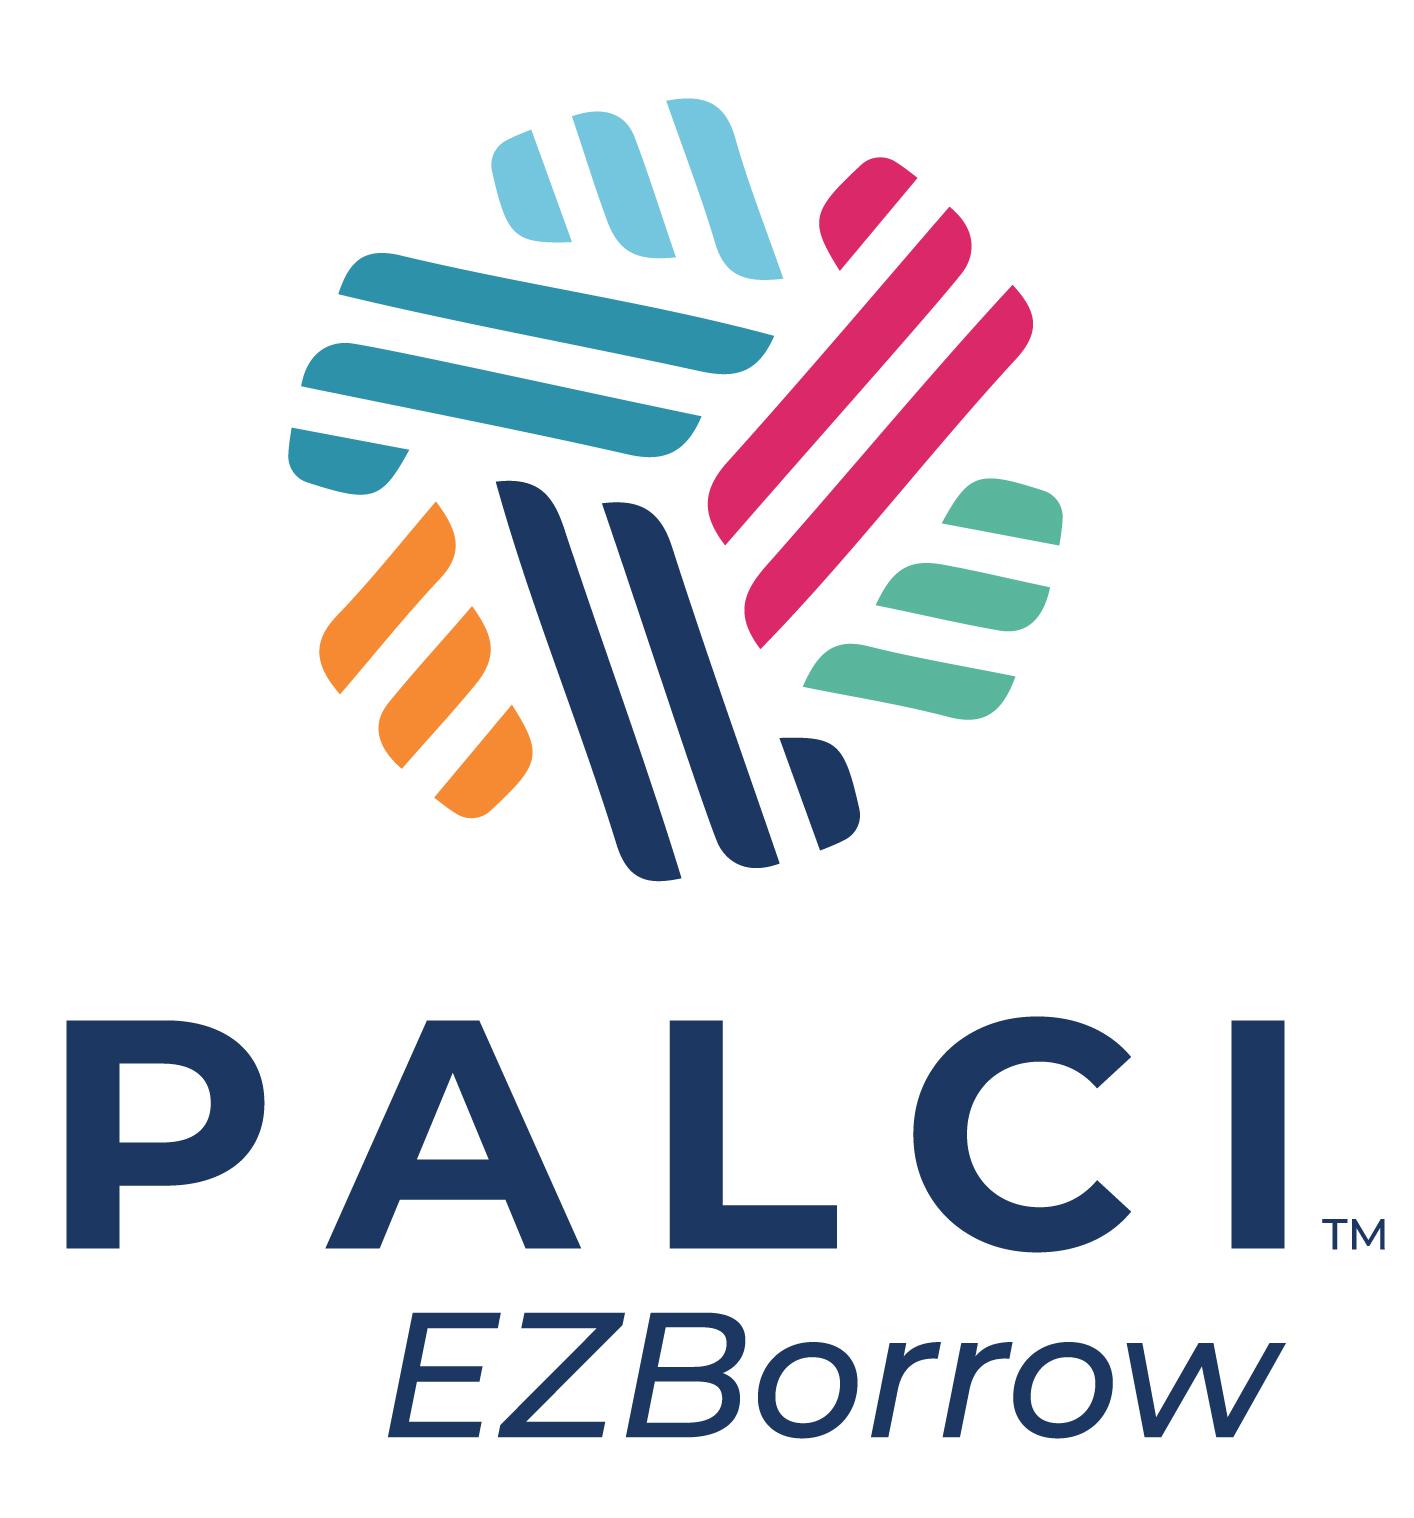 Click here to access EZ Borrow